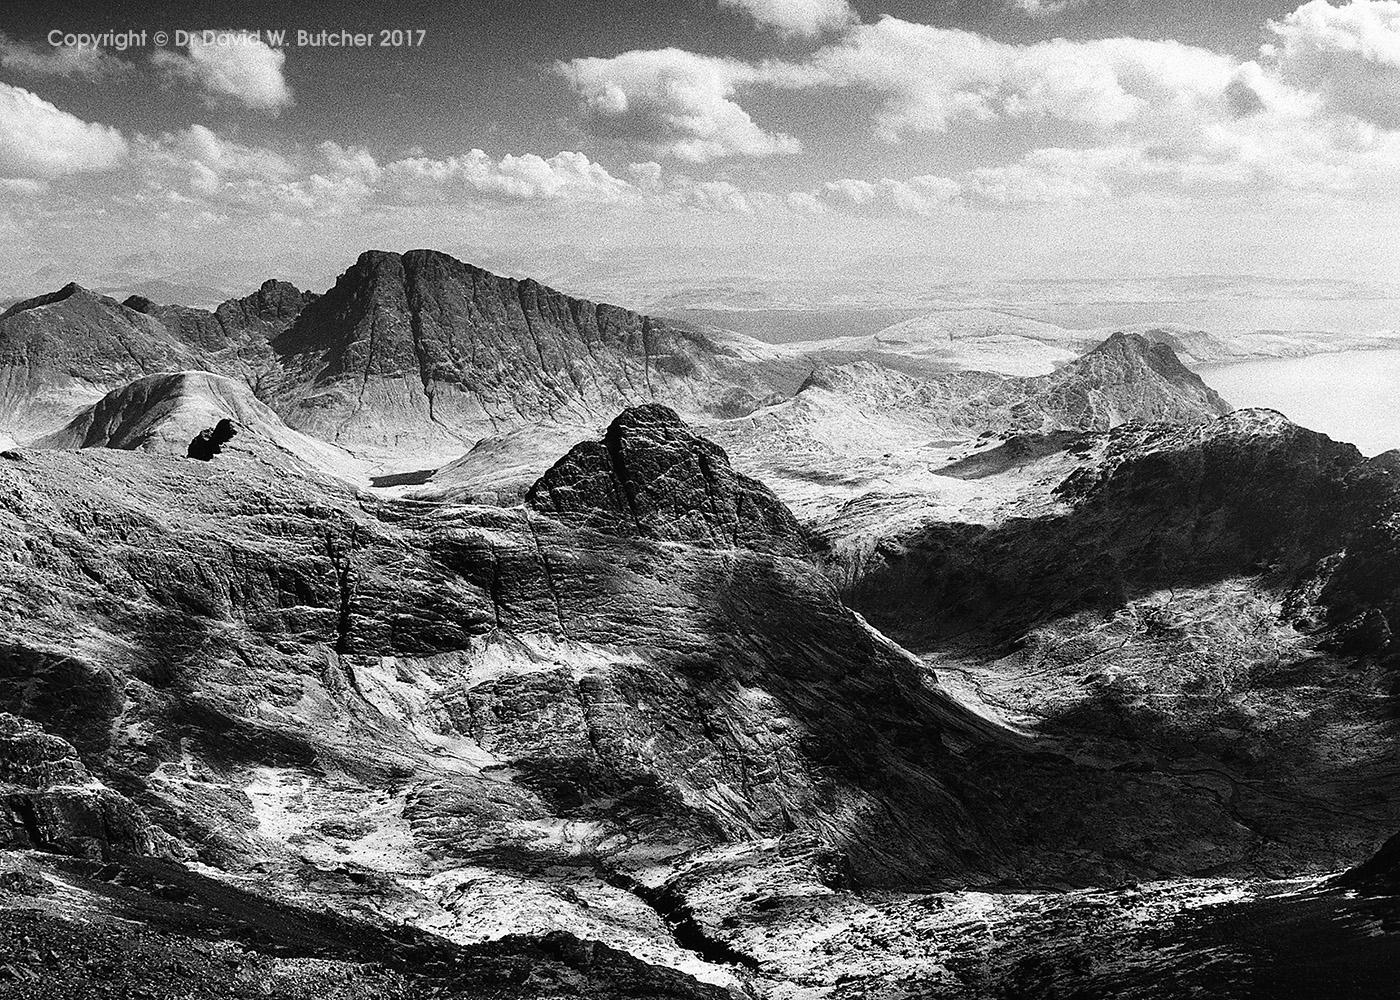 Lota Corrie, Black Cuillin, Skye, Scotland